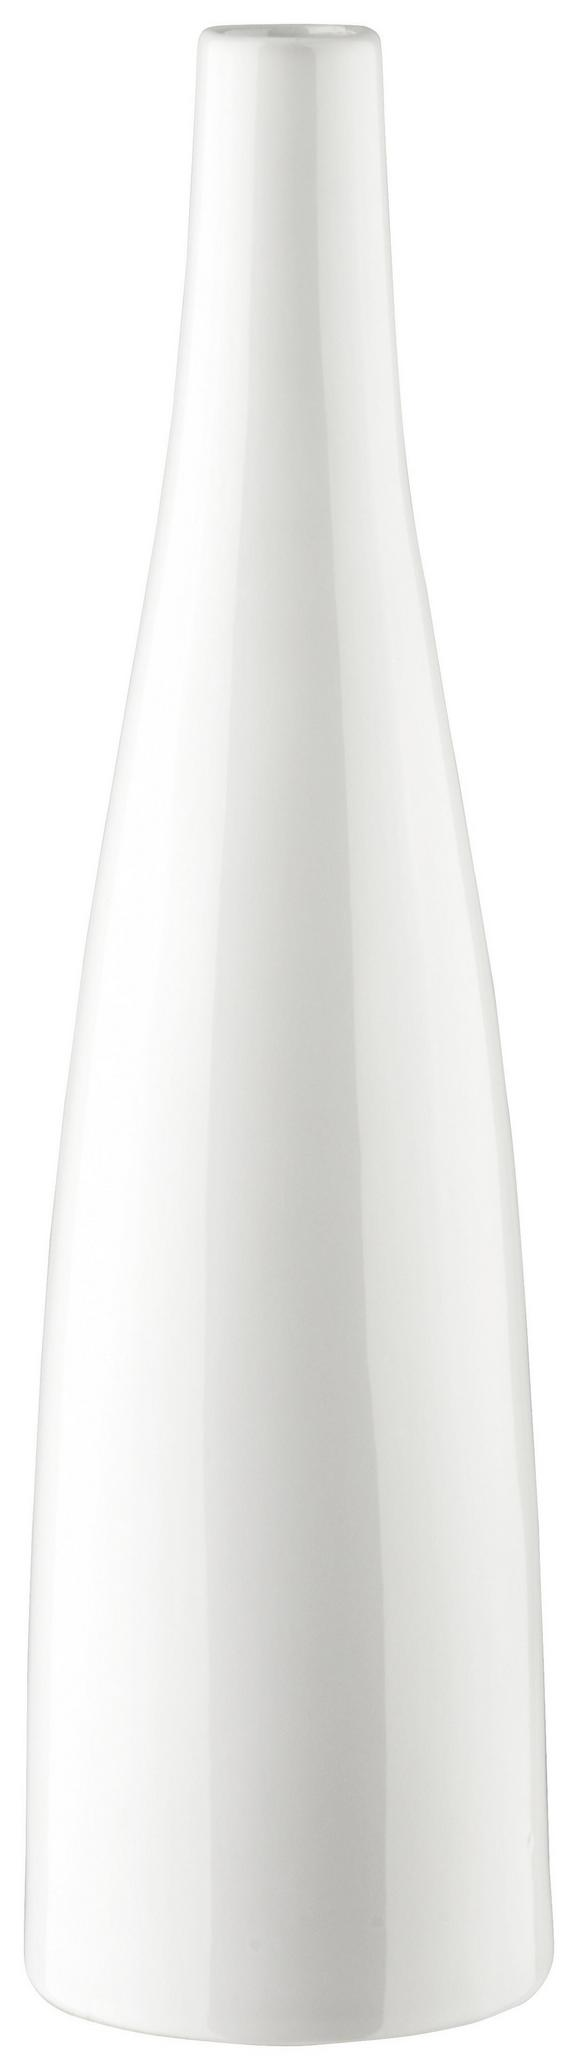 Vaza Plancio - bela, Moderno, keramika (39.6cm) - Mömax modern living